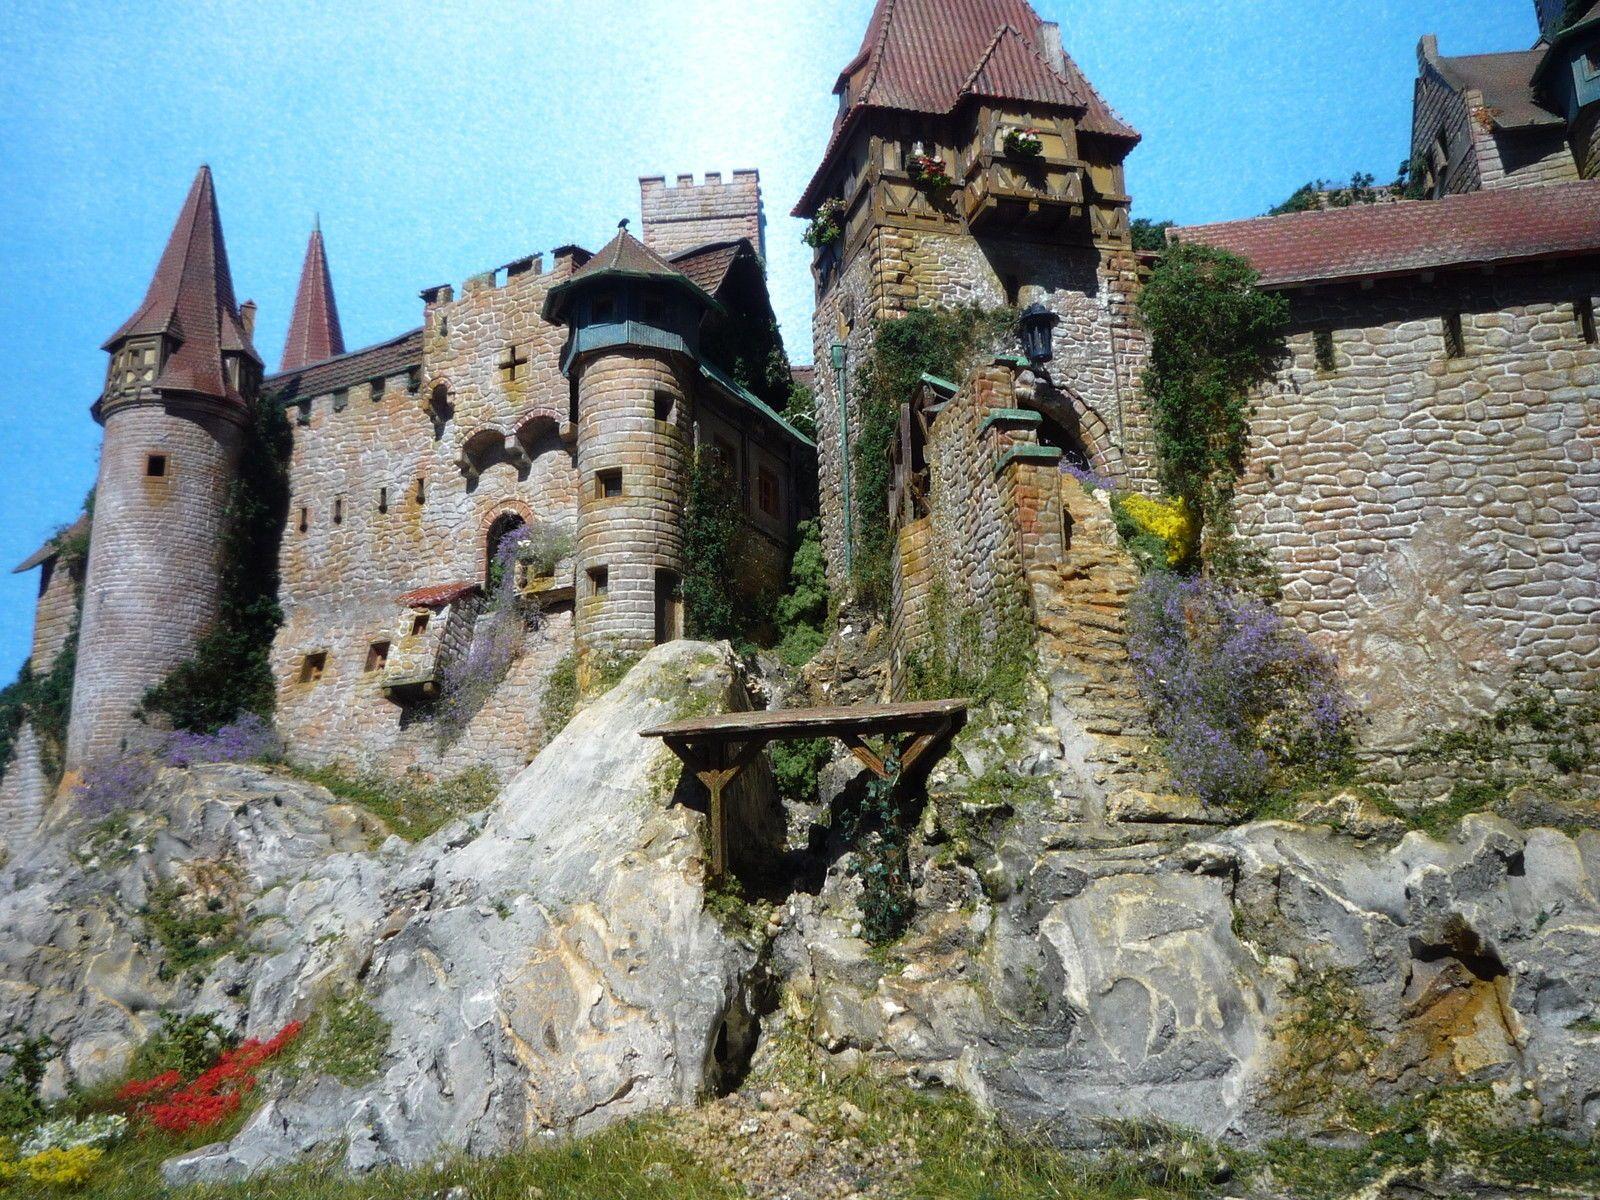 Diorama Castle Burg Schloss Elbenwald Patiniert Beleuchtung Kutsche Ebay Modeltreinen Kastelen Huisjes